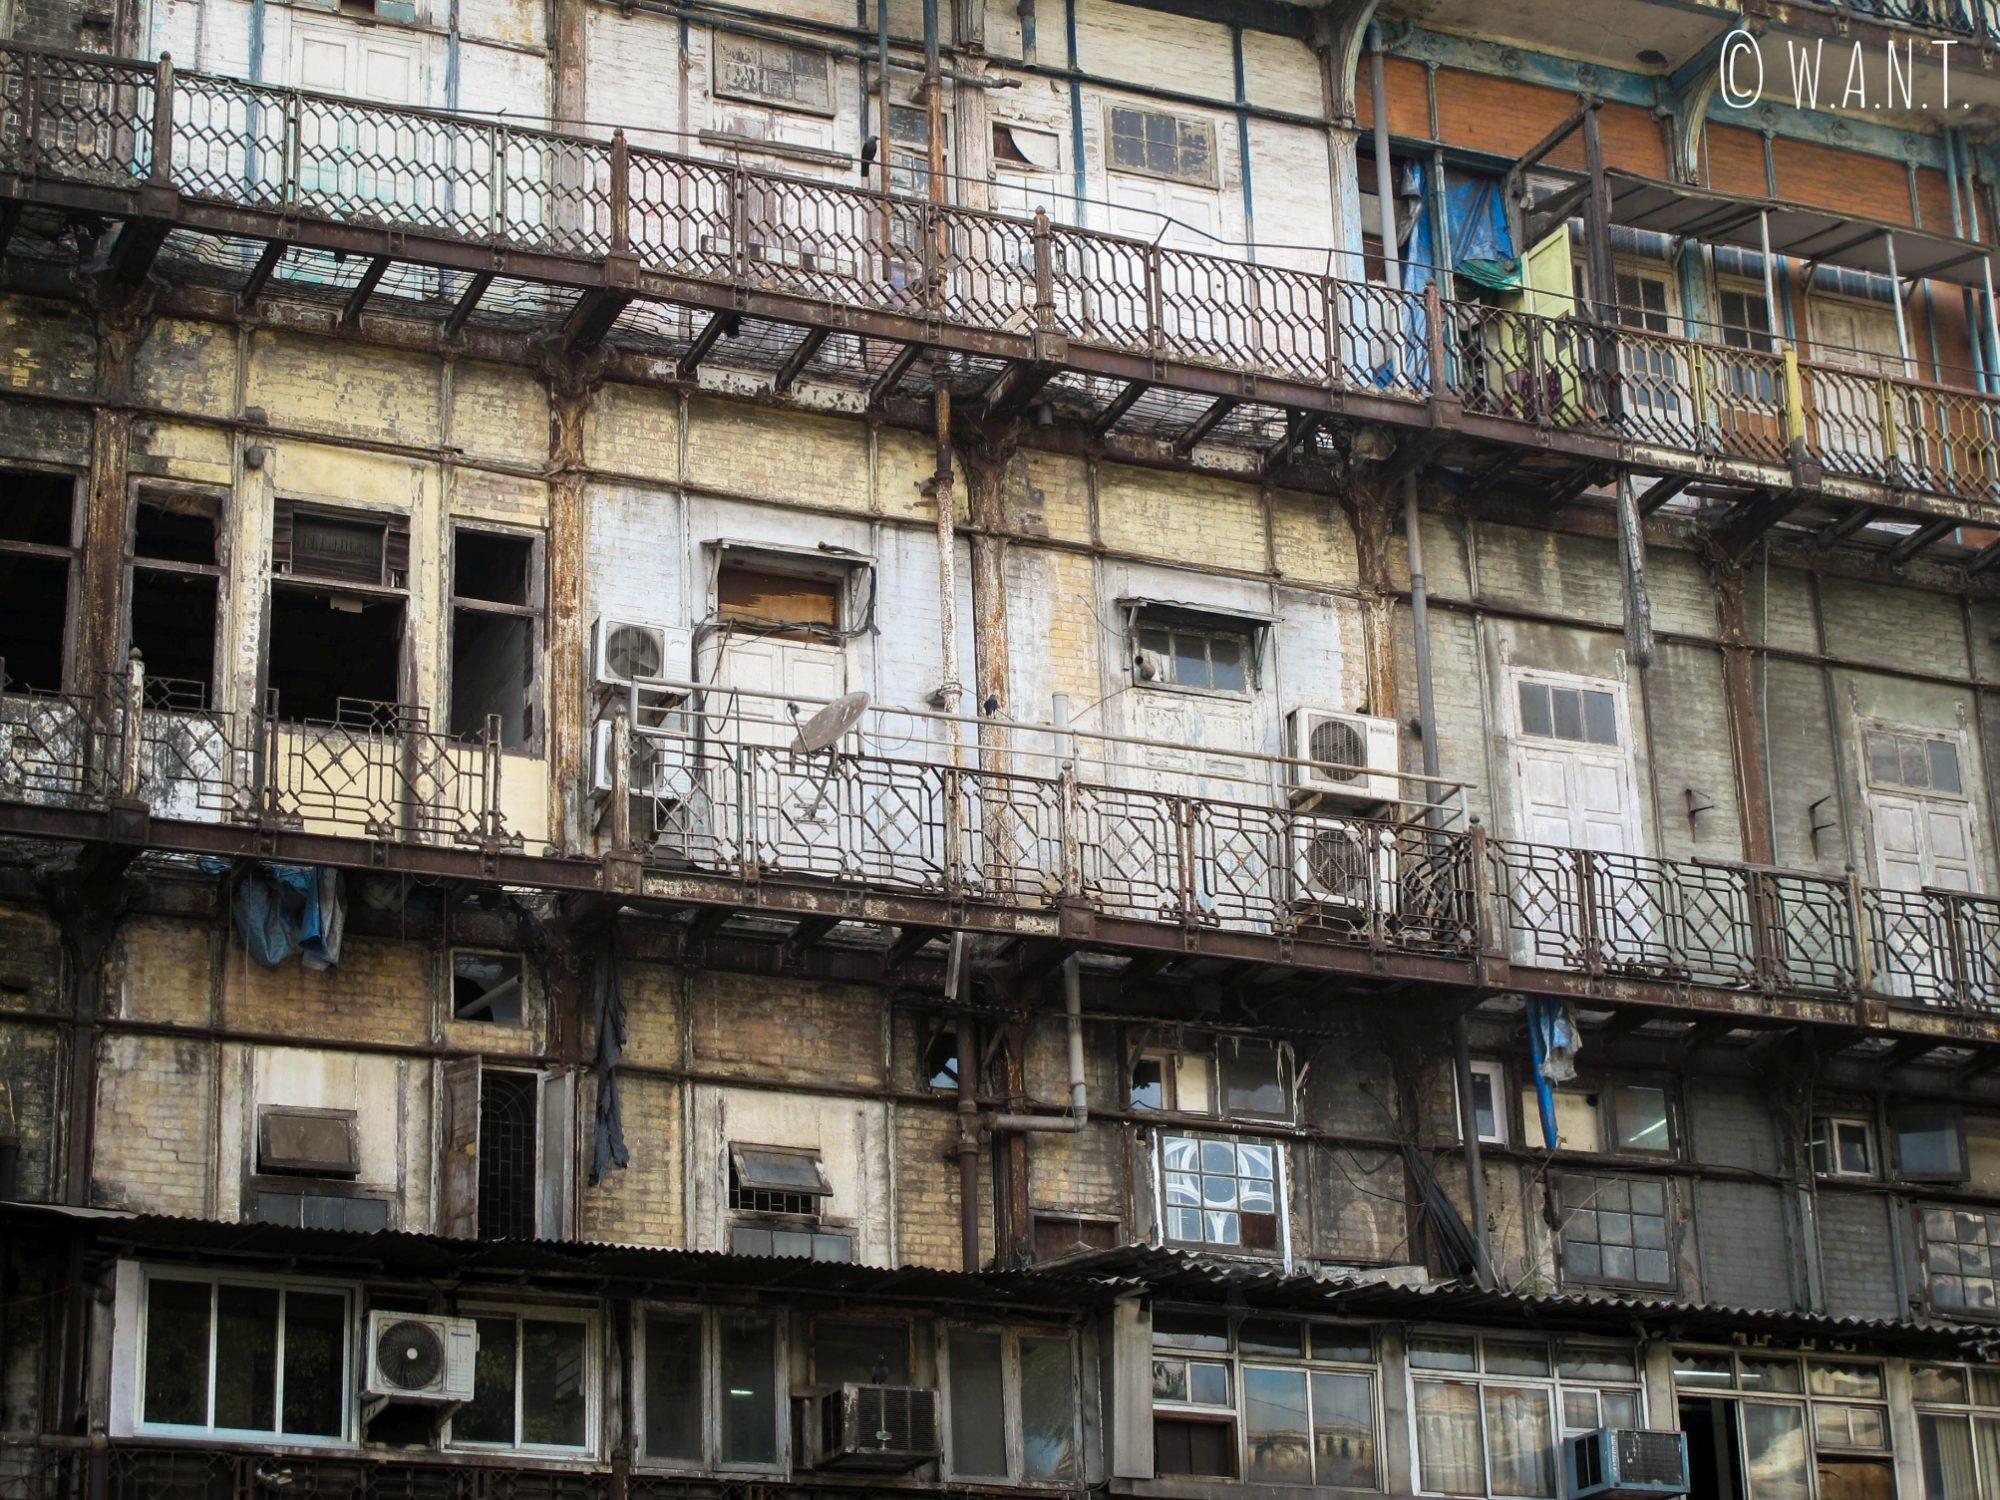 Façade d'immeubles dans les rues de Mumbai